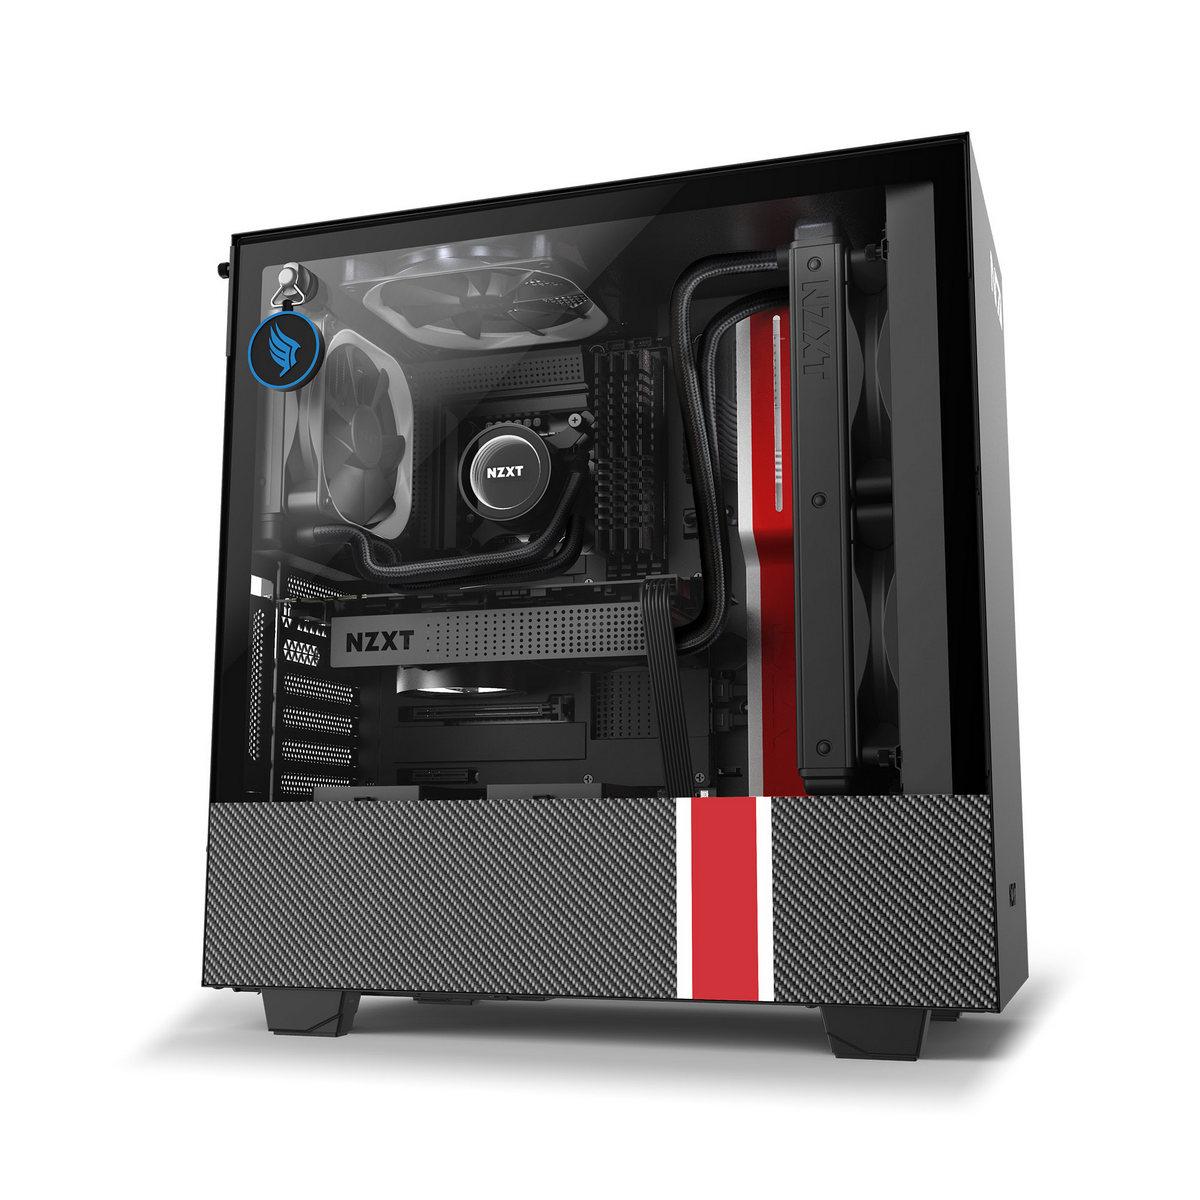 PC CRFT 07 H510i